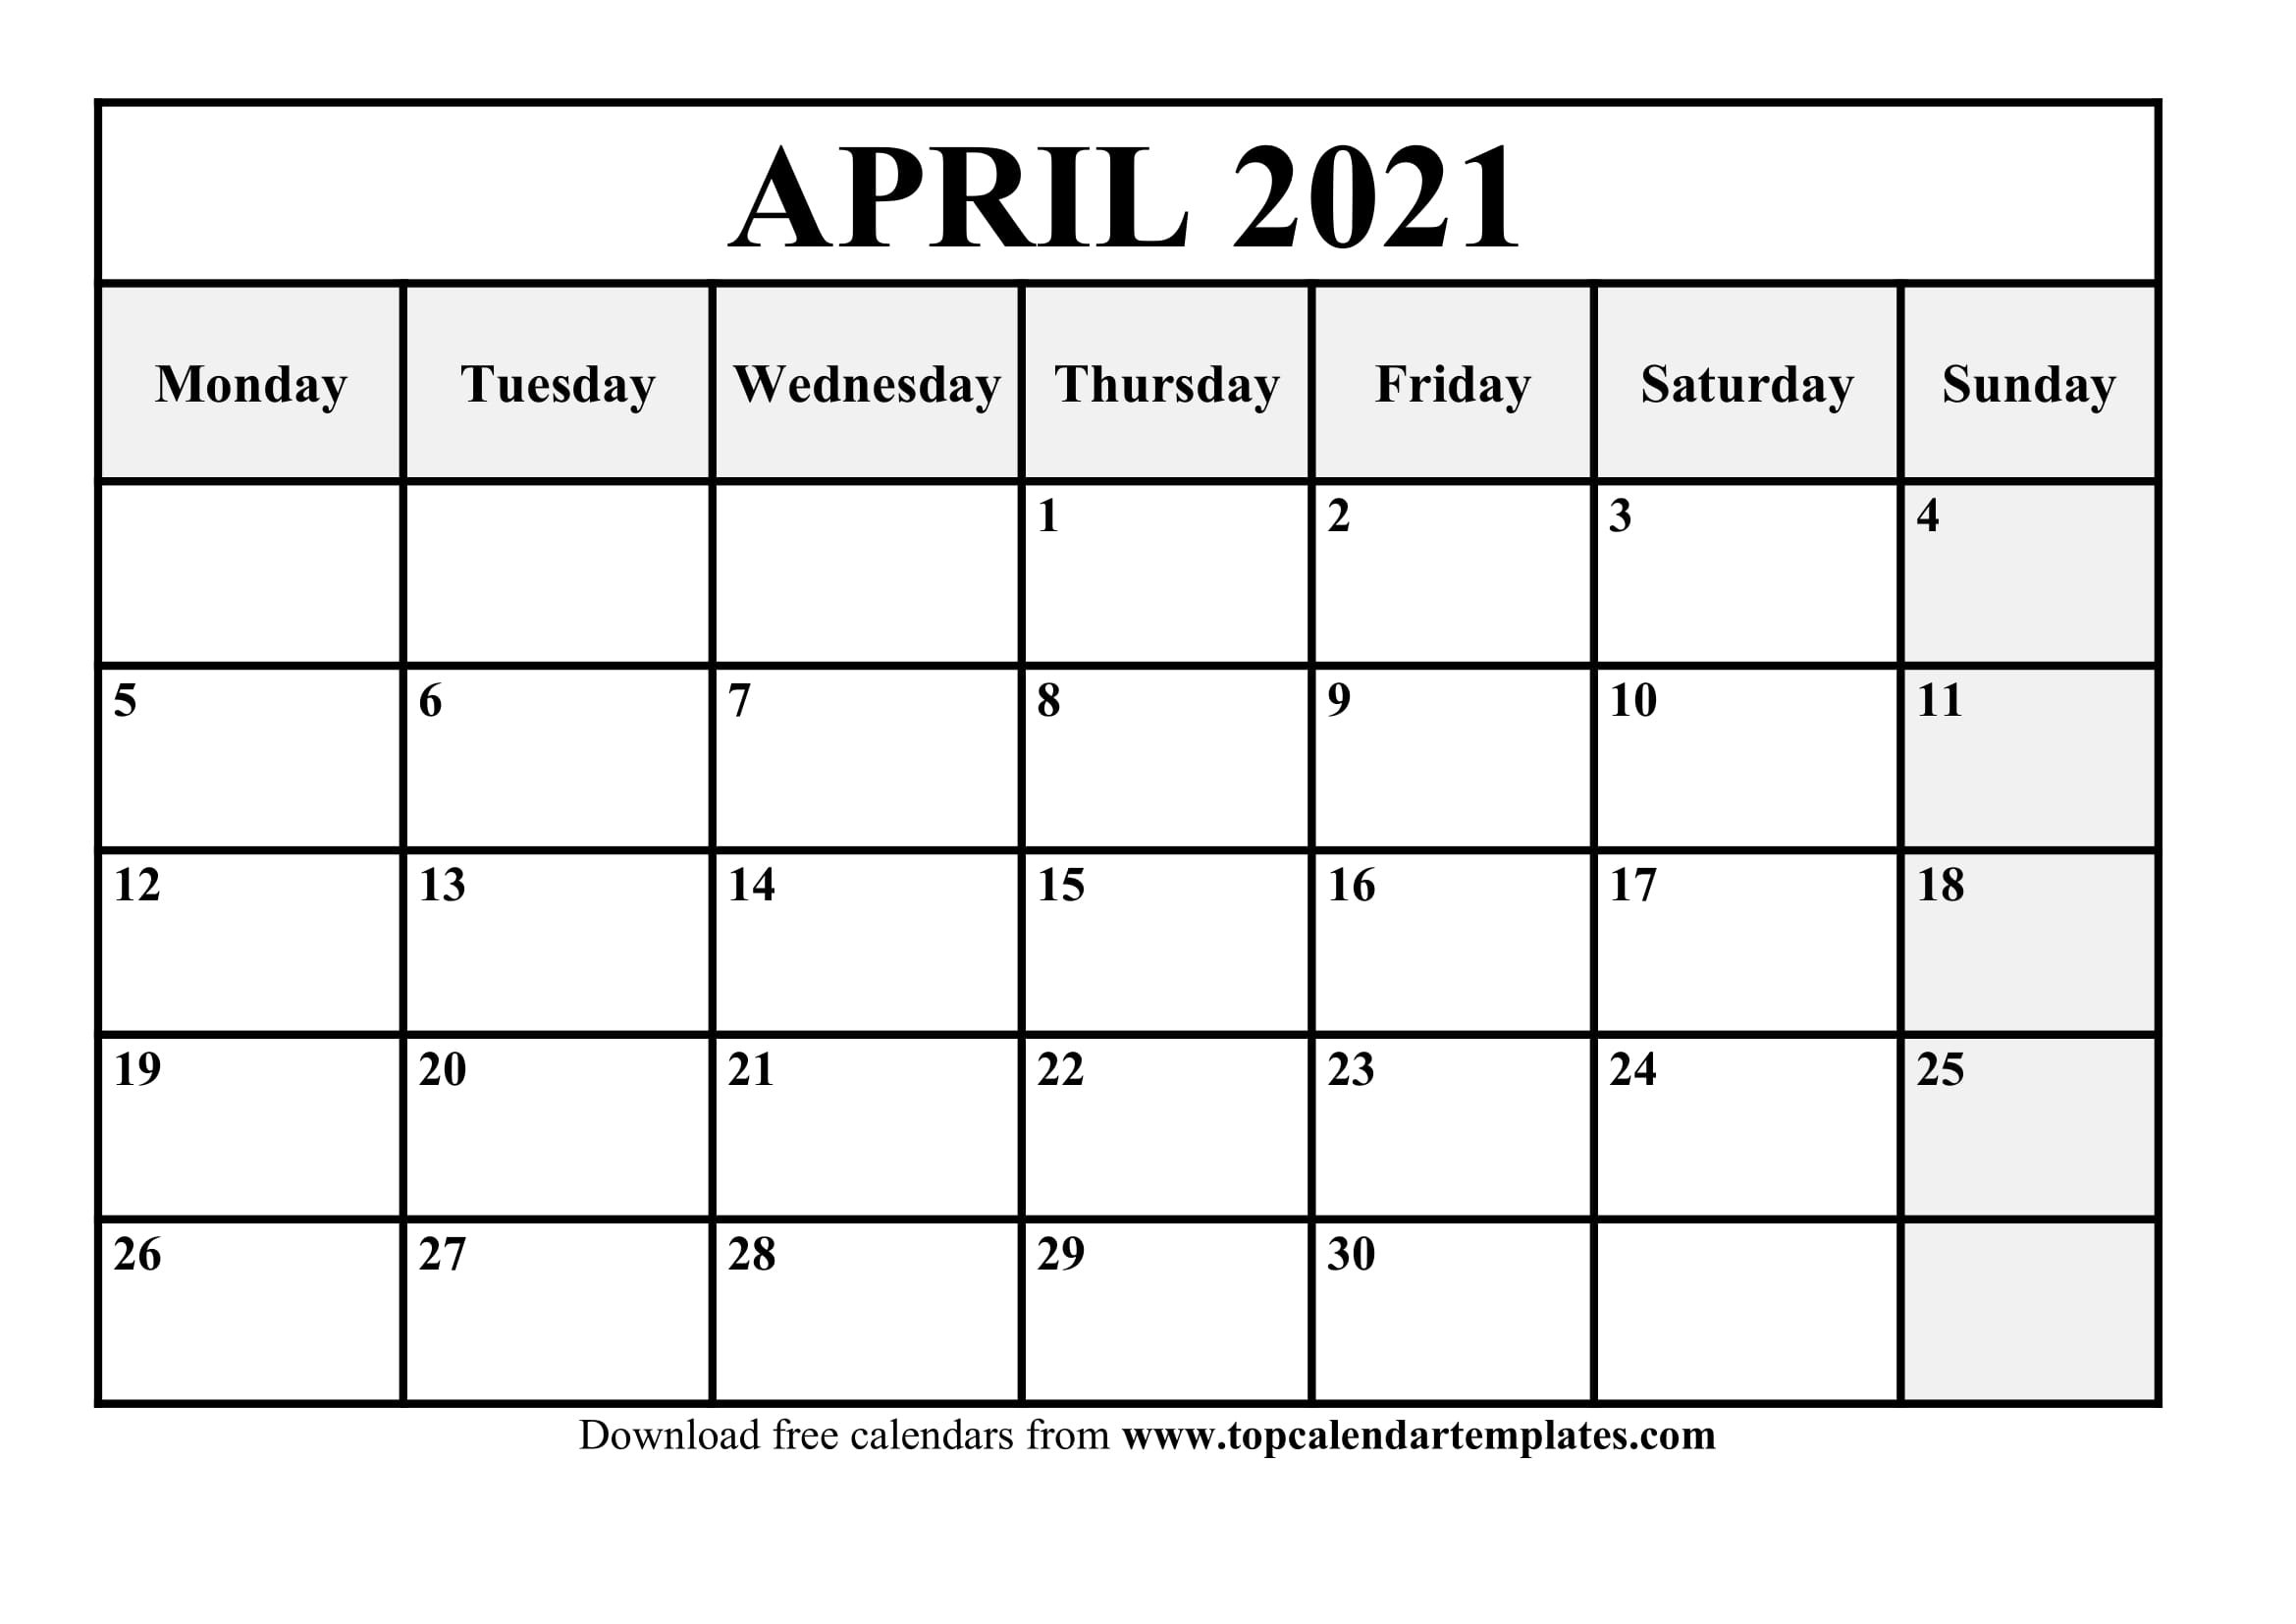 Free April 2021 Printable Calendar In Editable Format Free Caolendar To Fill In Online